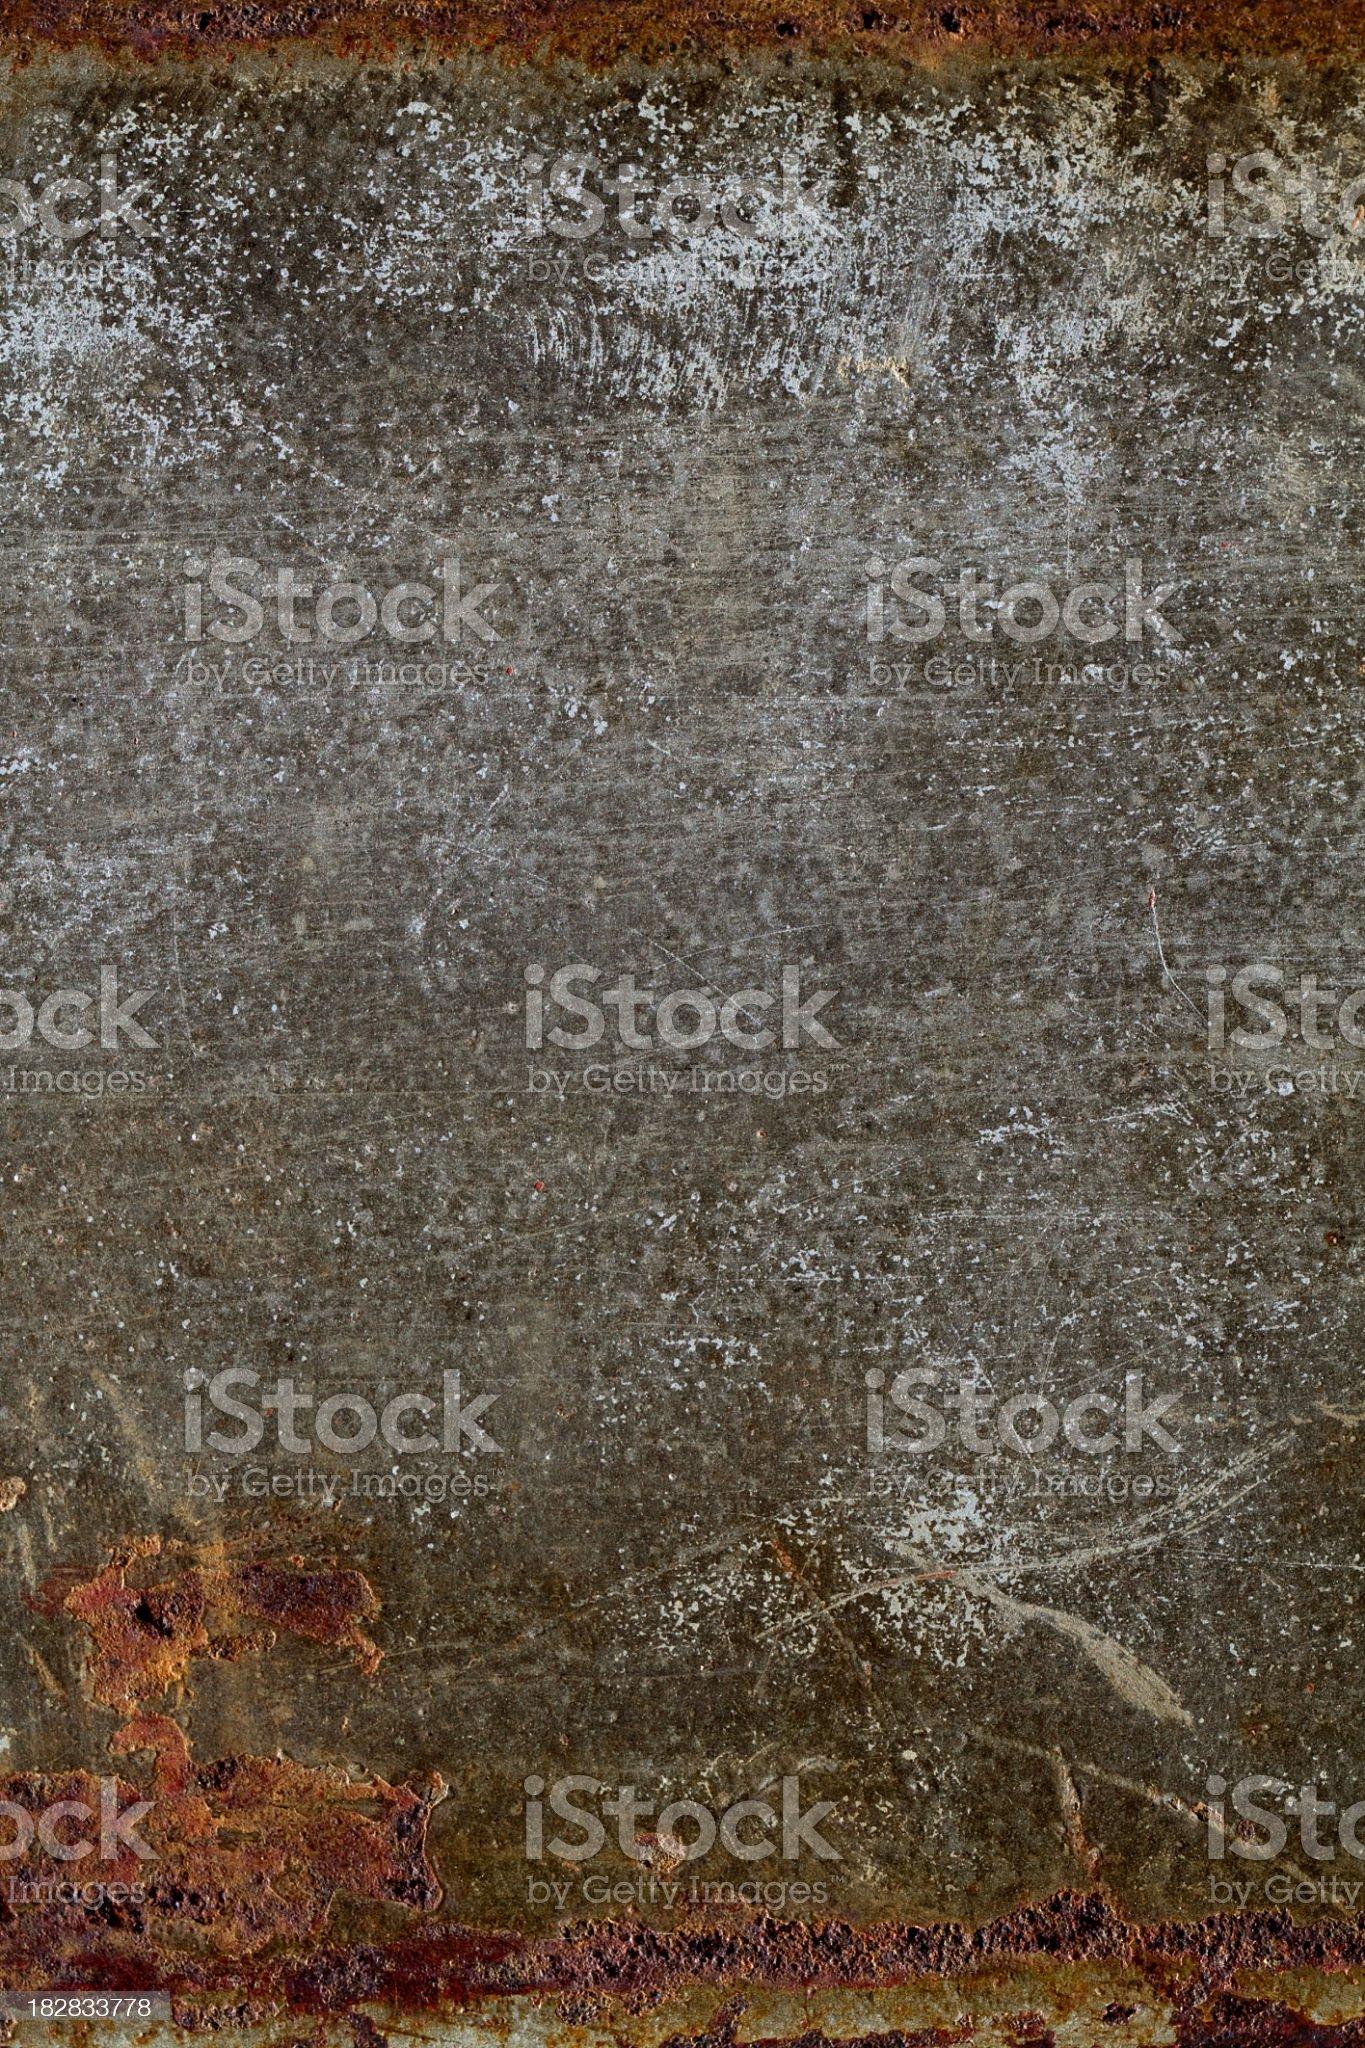 Rusty concrete grunge background royalty-free stock photo